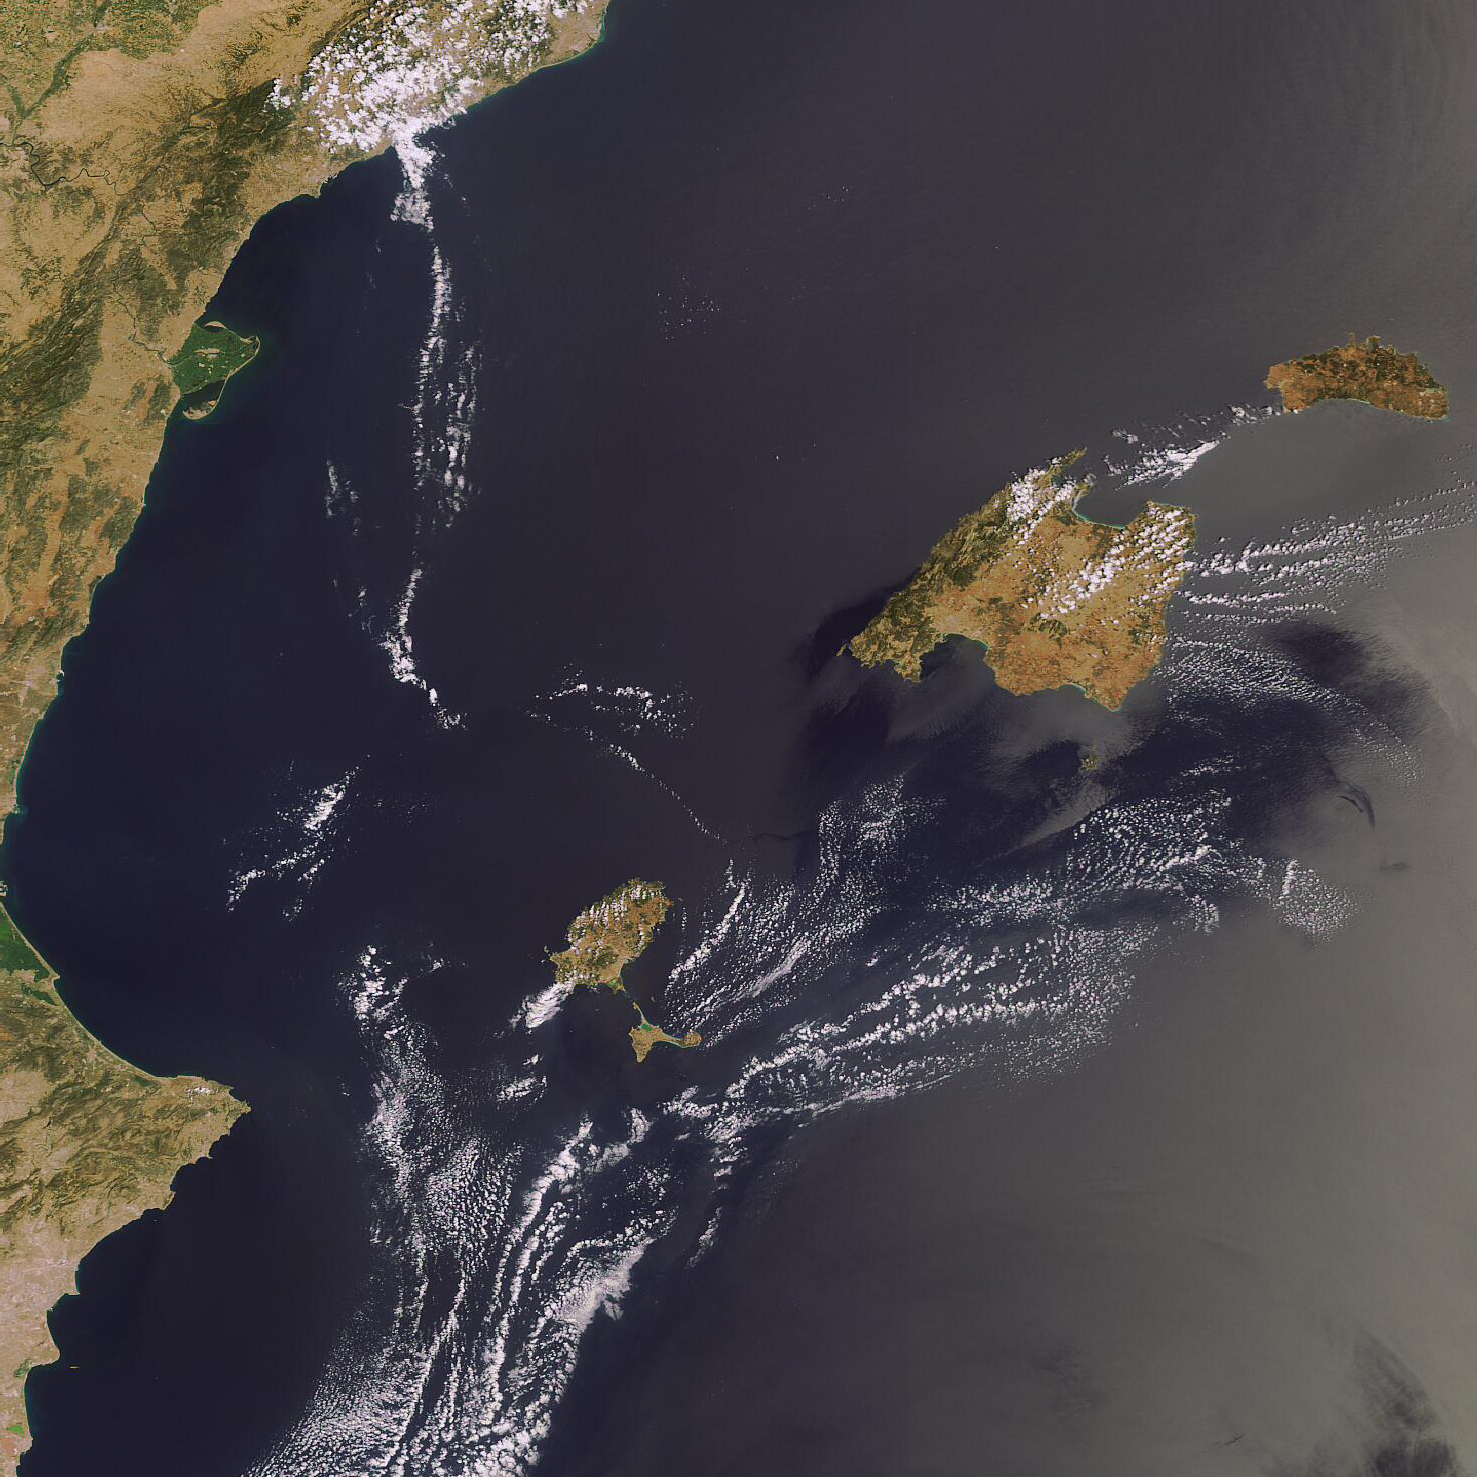 Imagen satelital de las Islas Baleares 2006